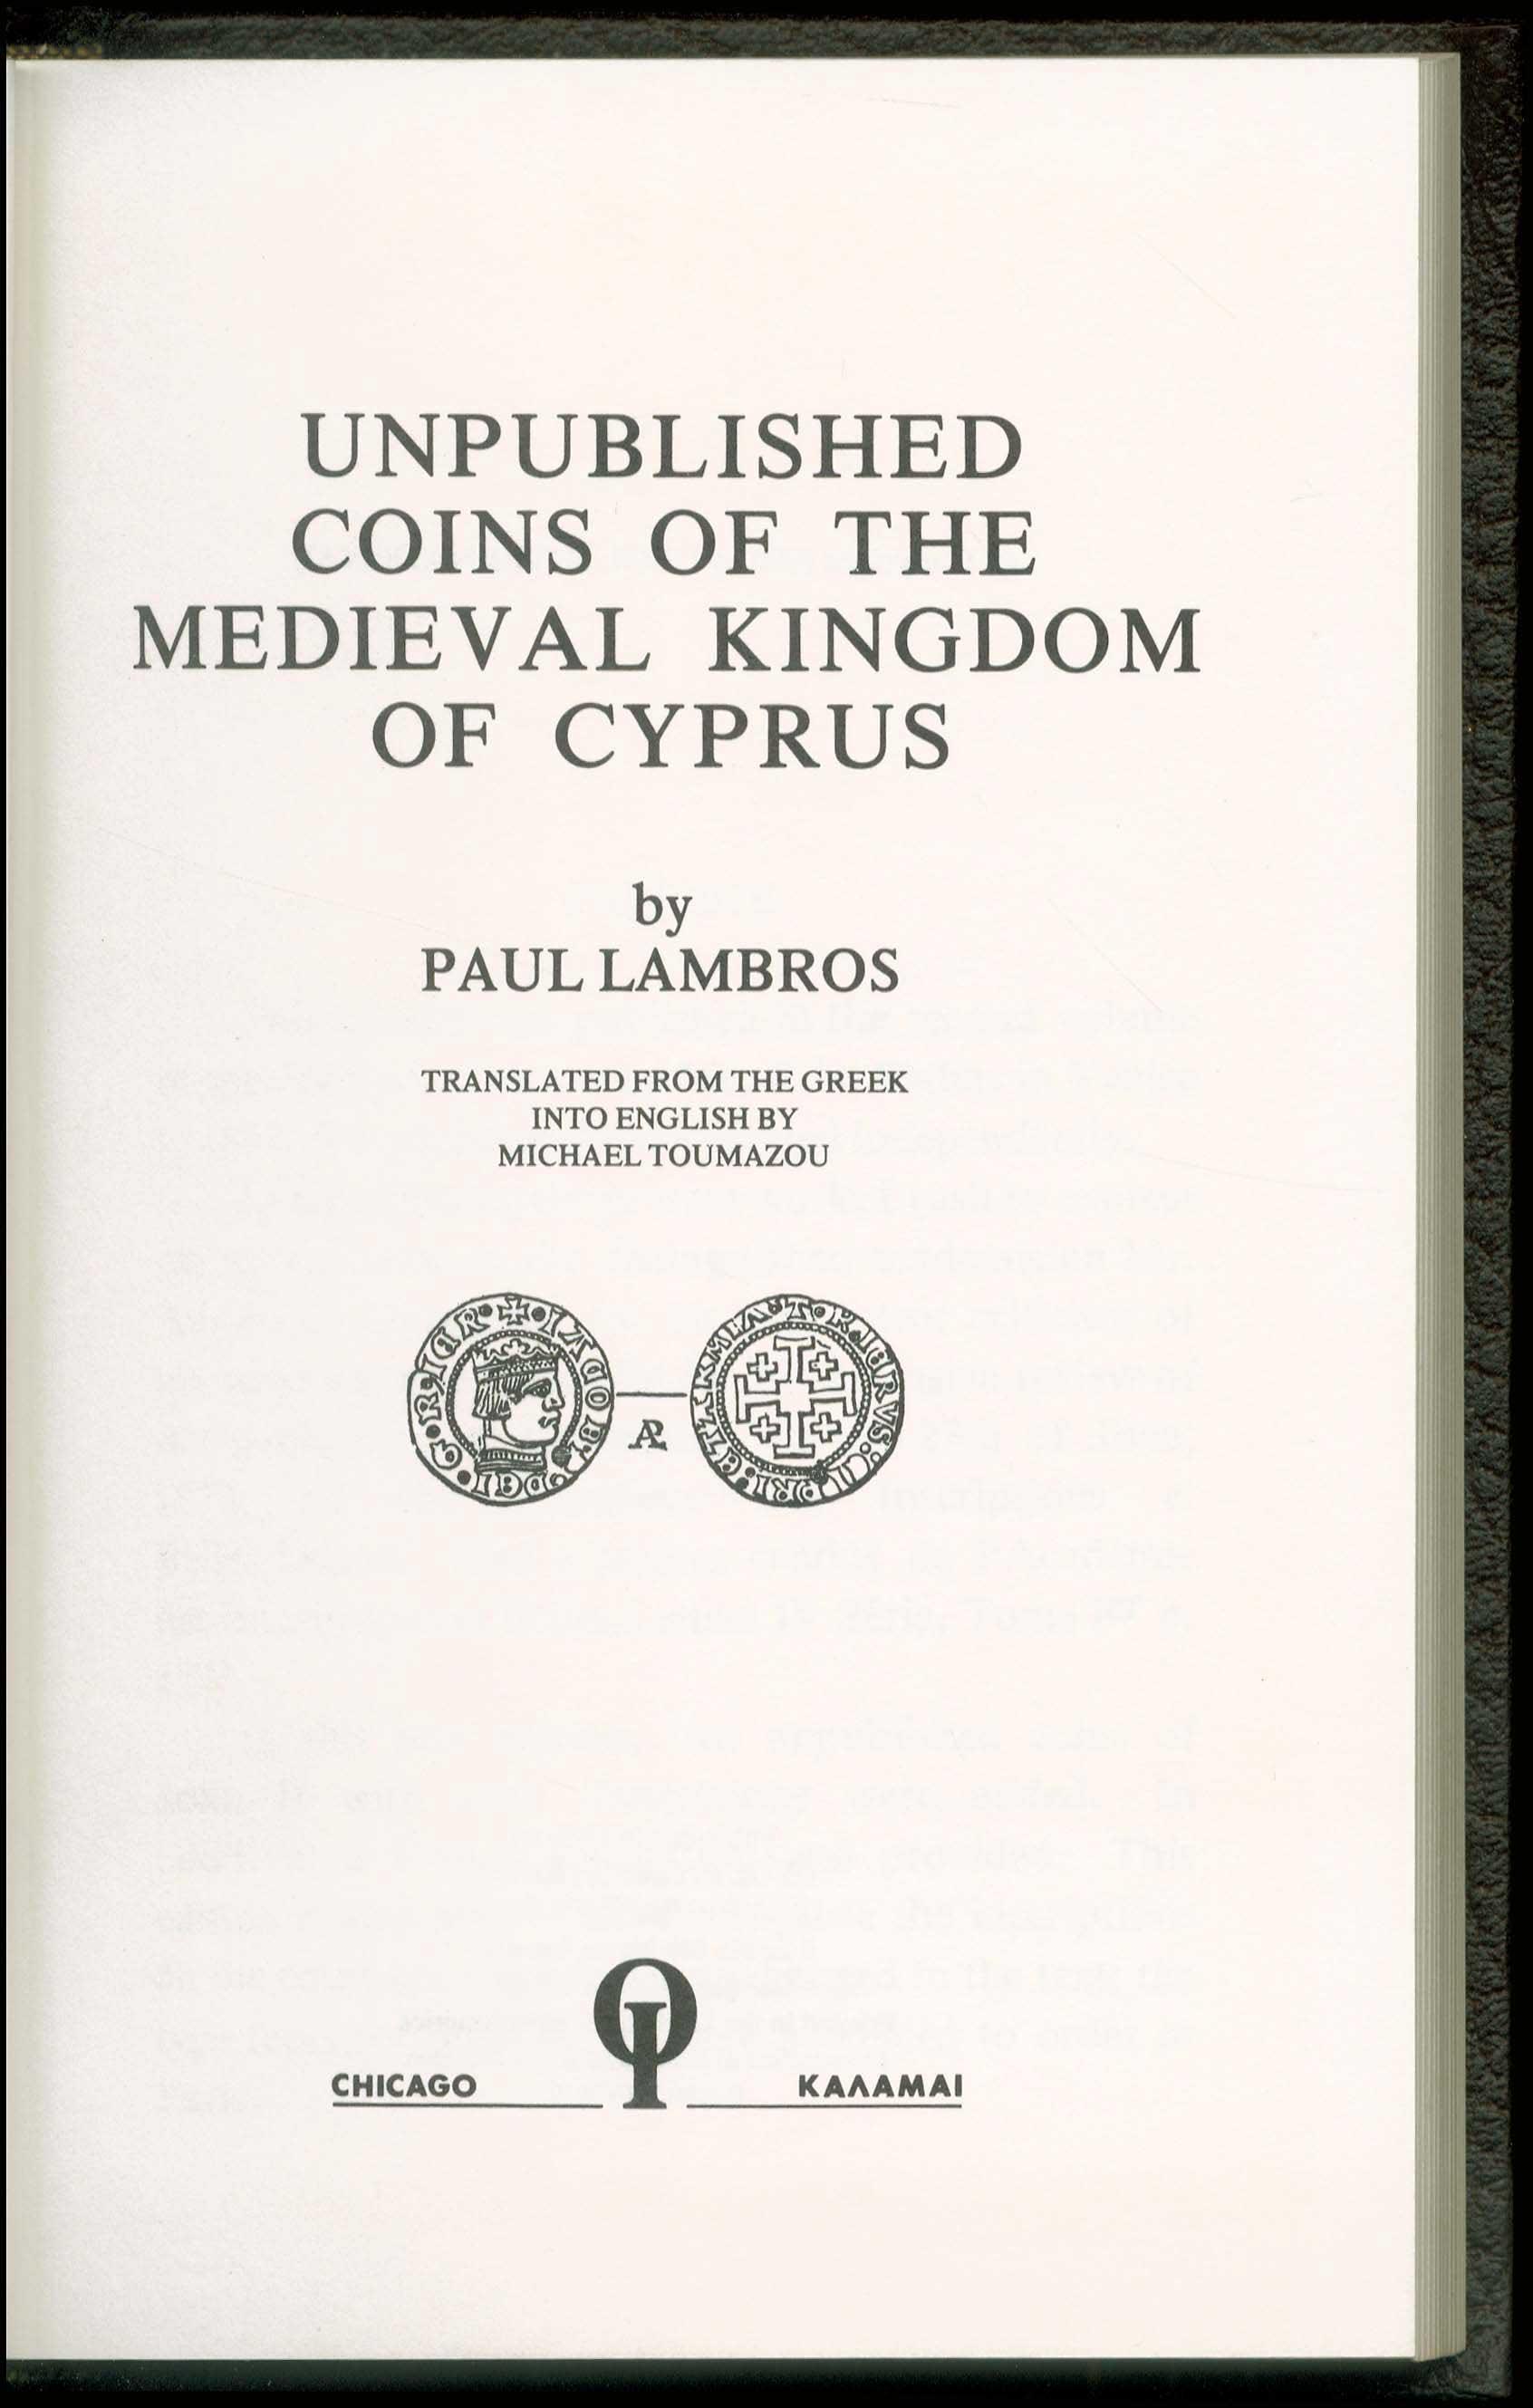 Lot 8001 - -  BOOKS ΑΡΧΑΙΟΛΟΓΙΑ / ARCHAEOLOGY - CLASSICAL ANTIQUITY -  A. Karamitsos Public & Live Bid Auction 649 Coins, Medals & Banknotes